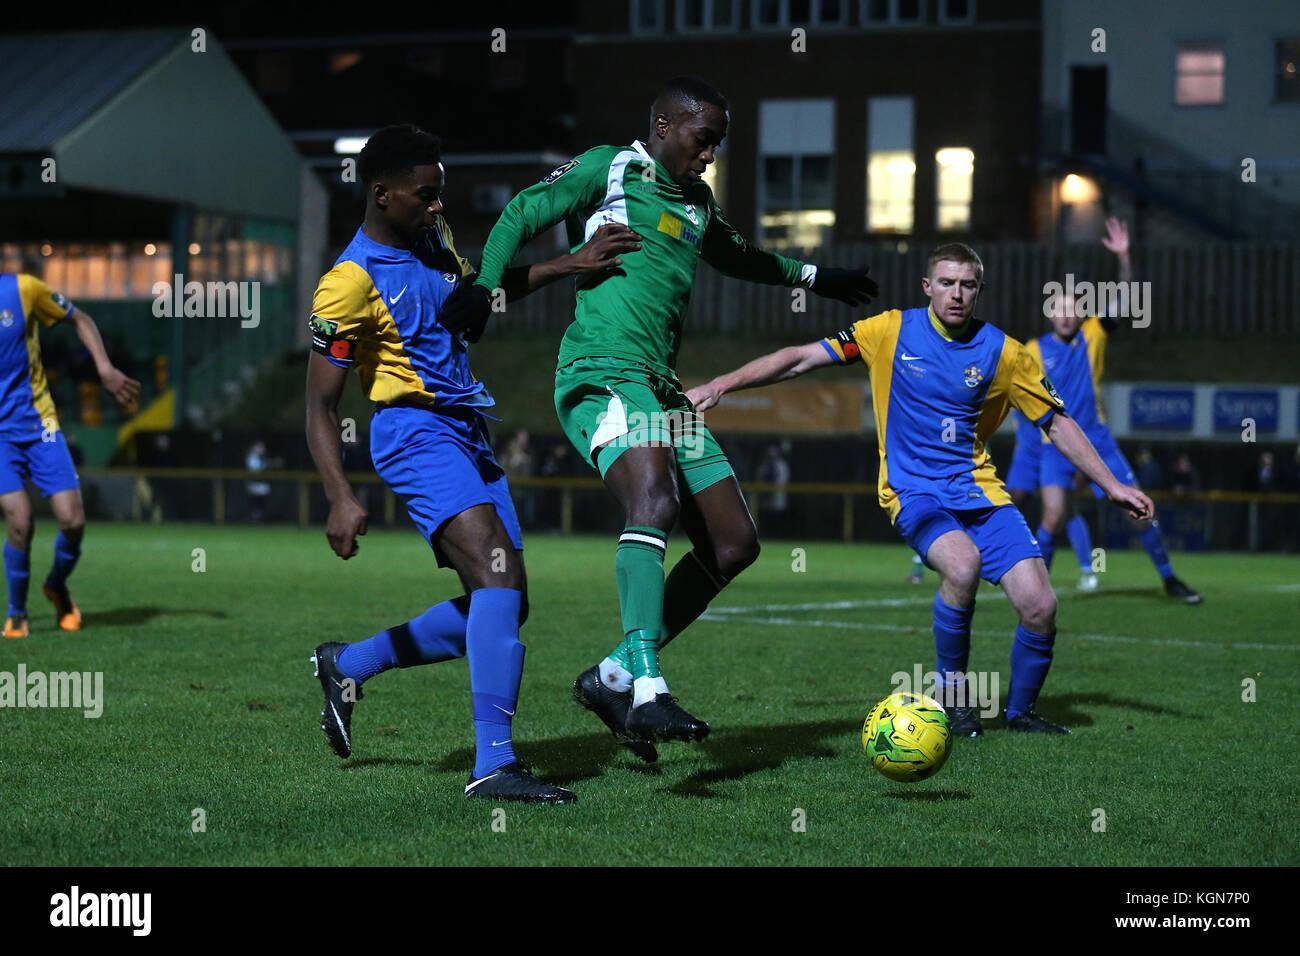 Quba Gordon of Haringey and Danny Cossington of Romford during Romford vs Haringey Borough, Bostik League Division - Stock Image